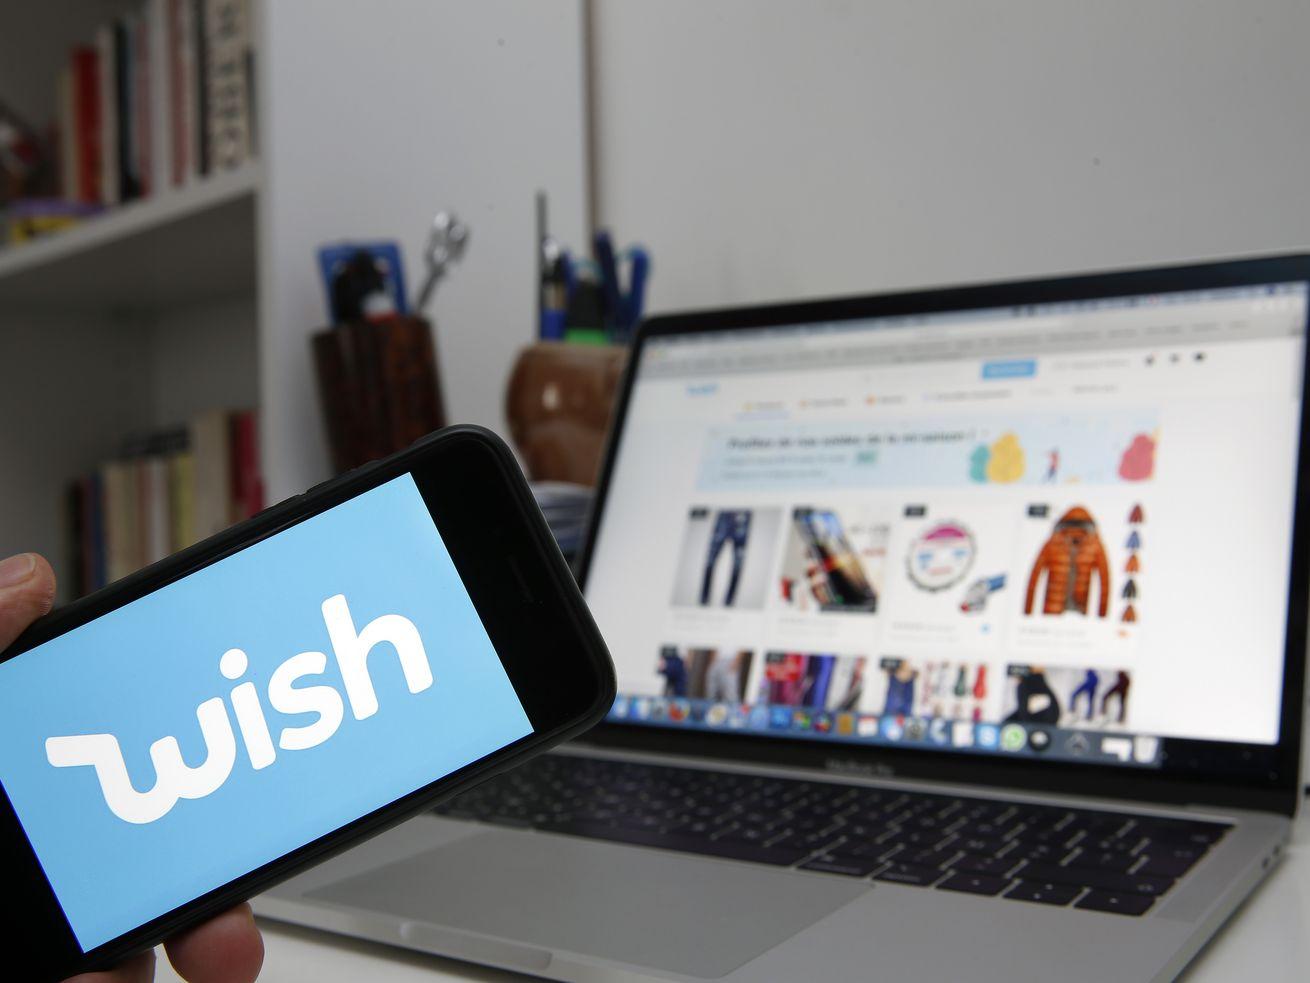 The Wish app had 161 million downloads last year.